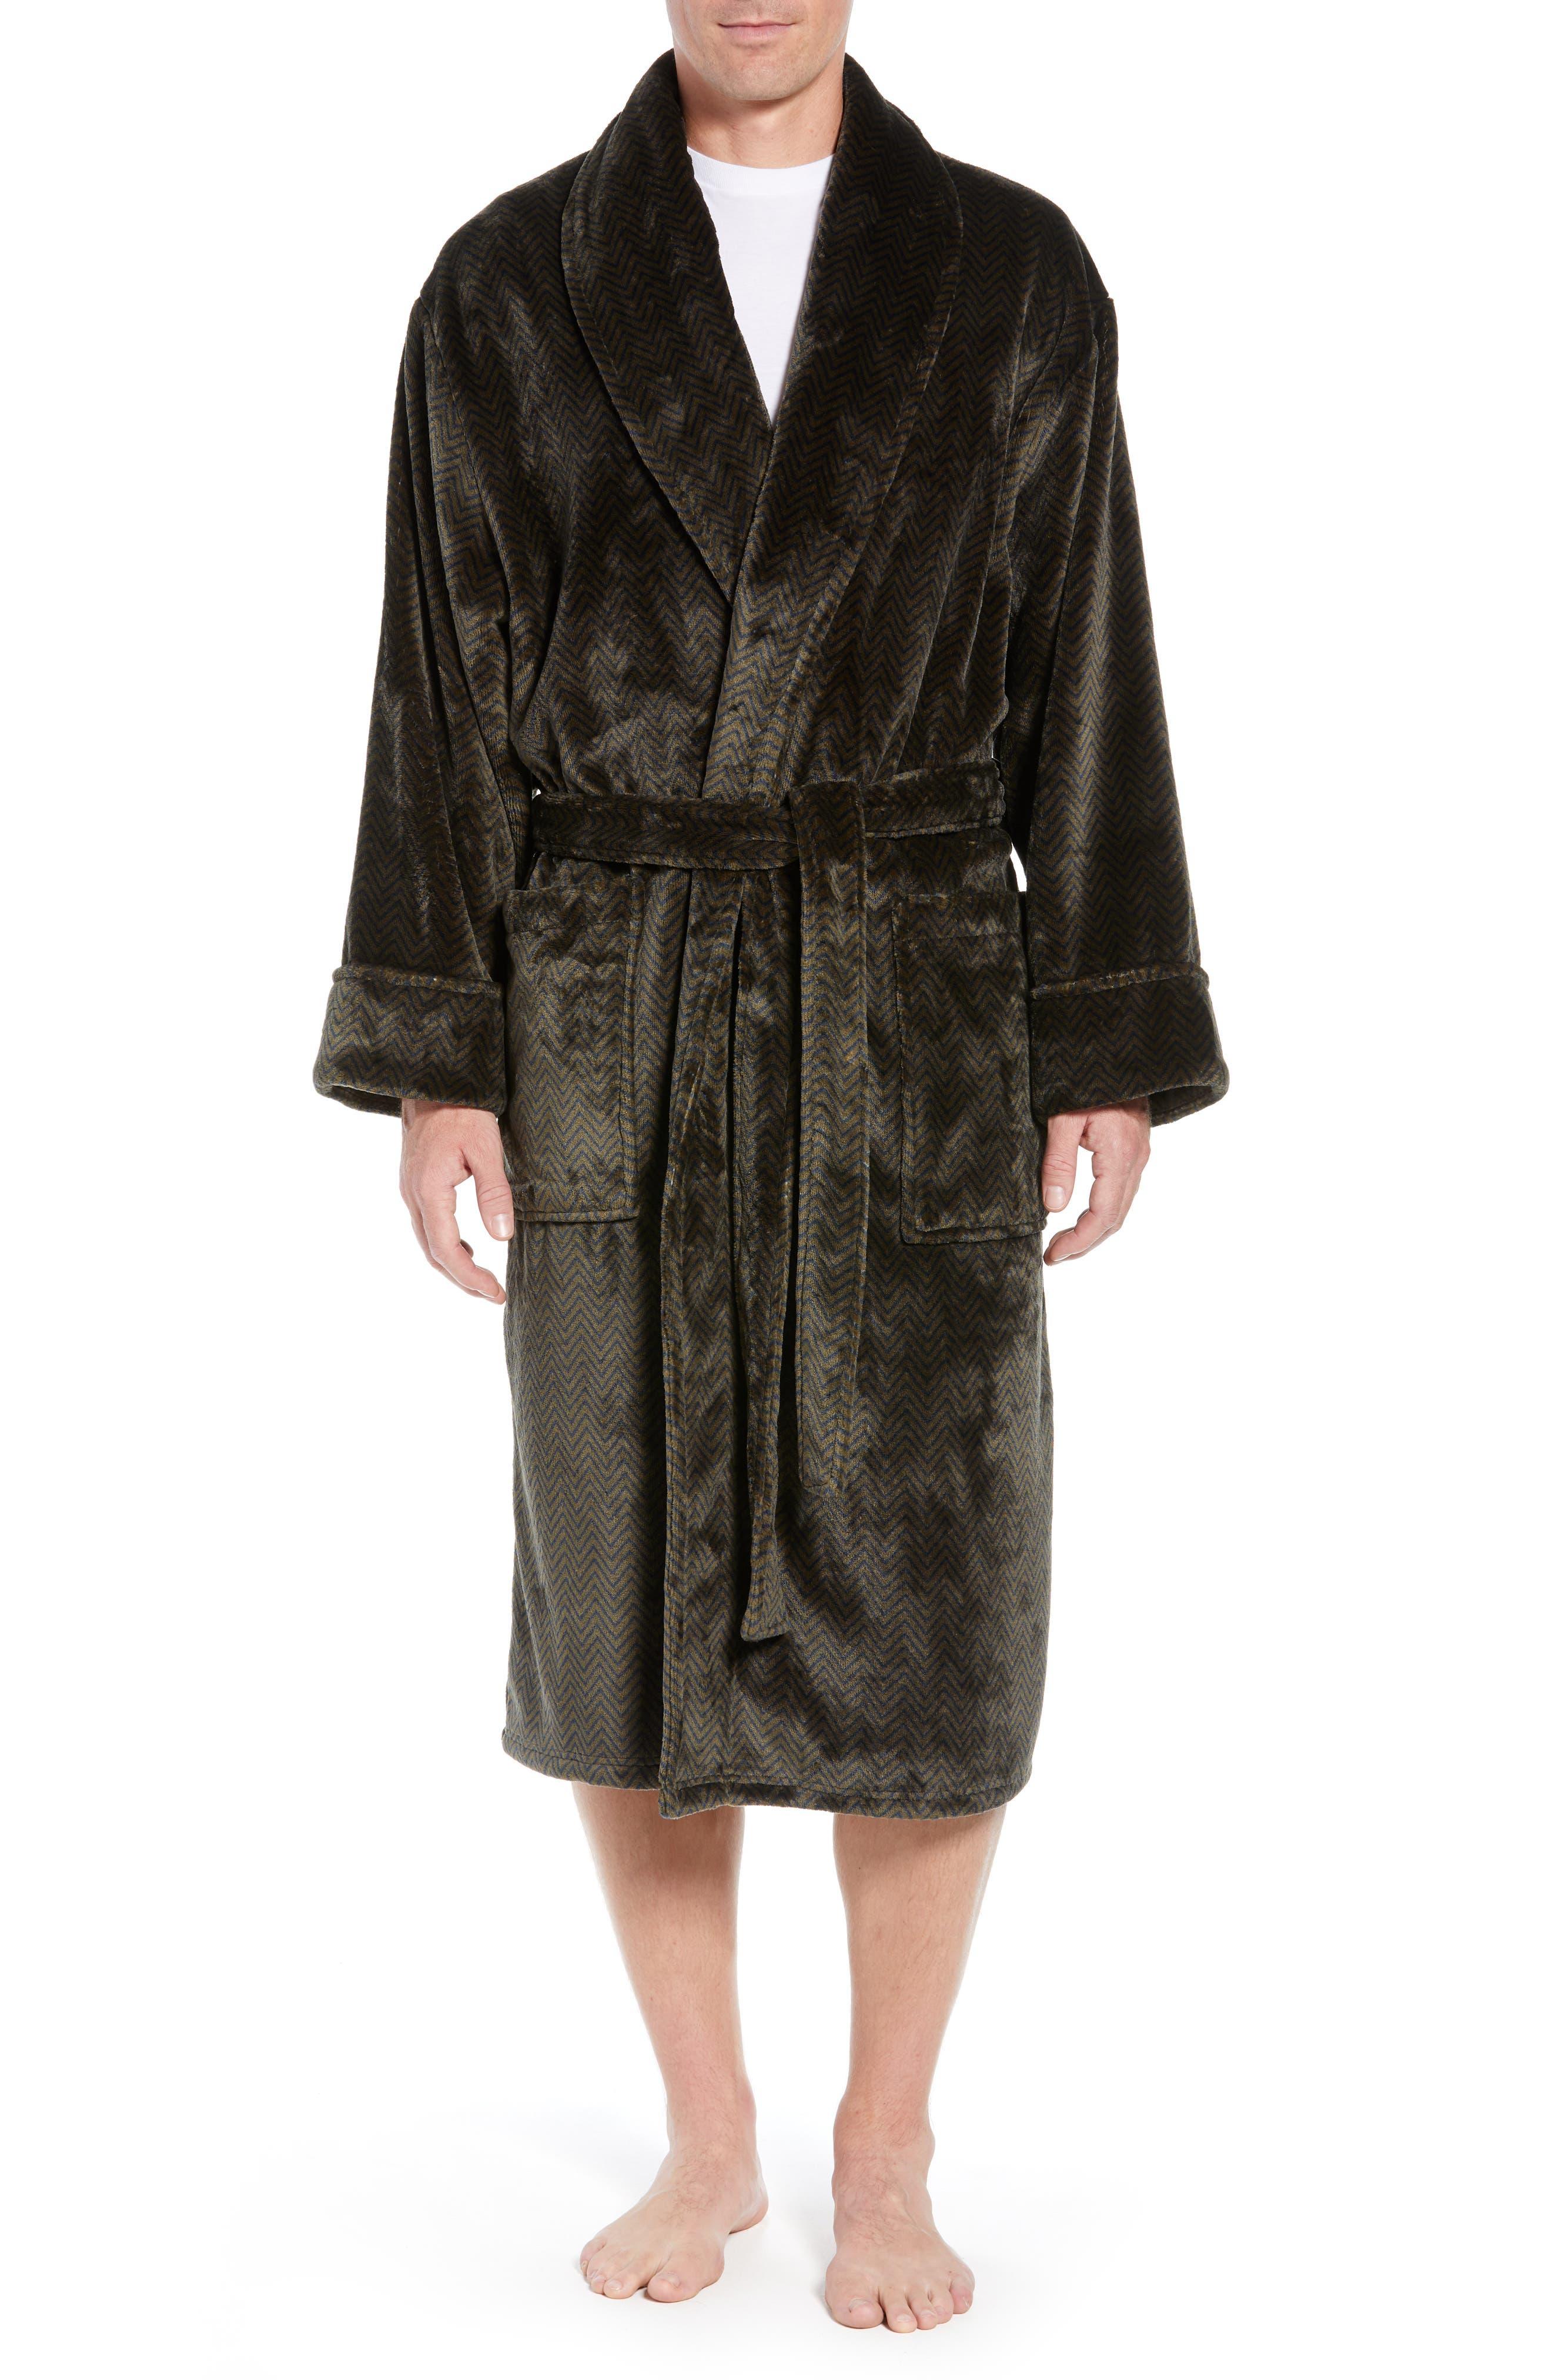 DANIEL BUCHLER, Chevron Fleece Robe, Main thumbnail 1, color, ARMY/ MIDNIGHT